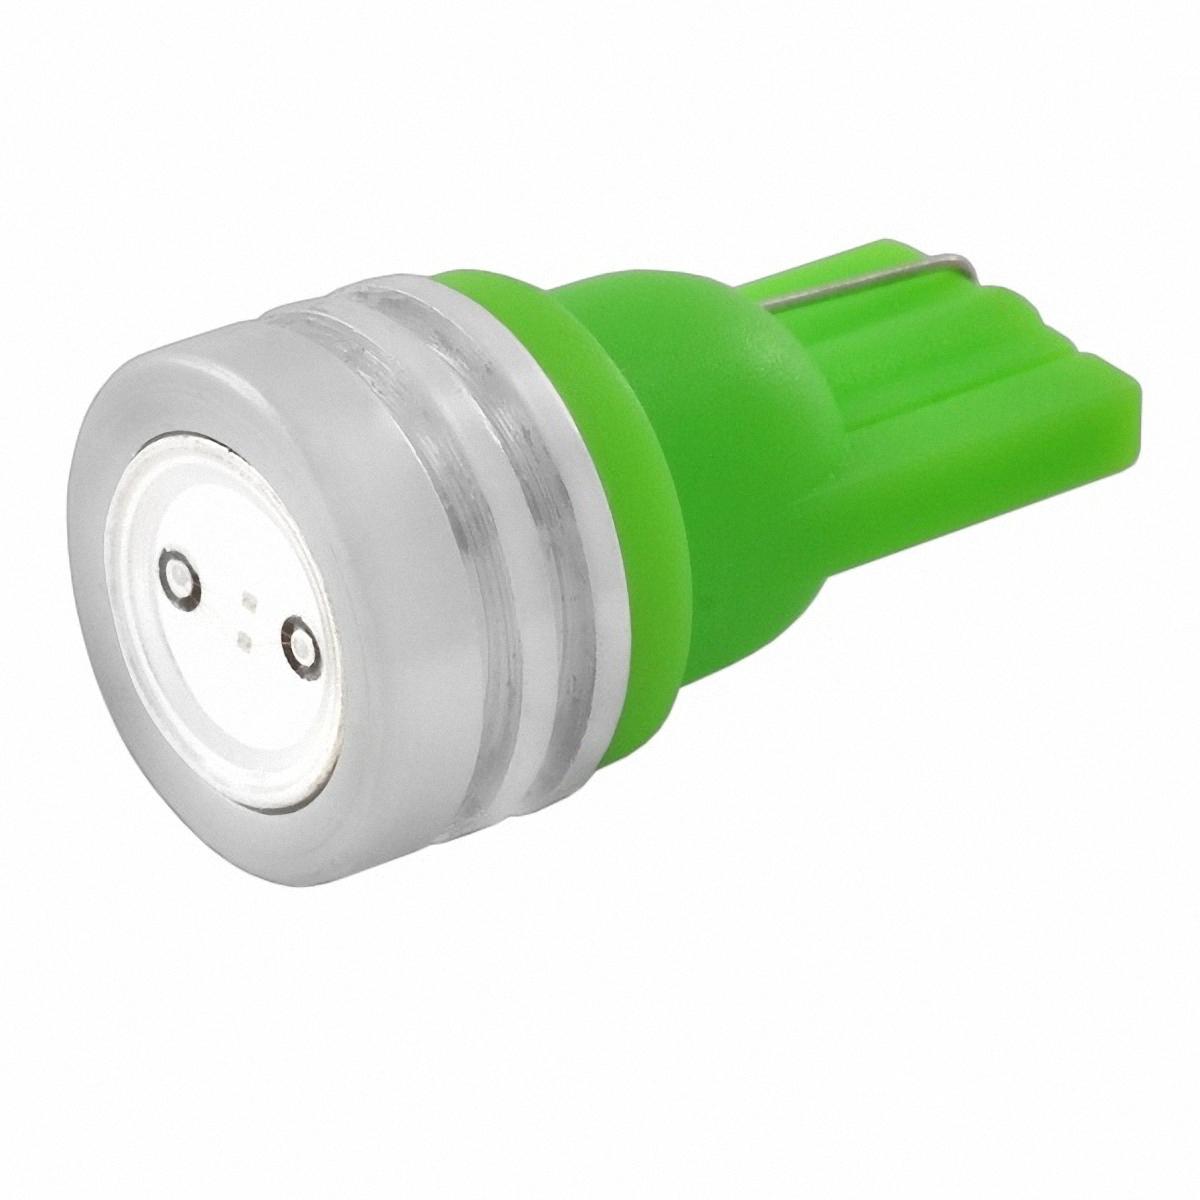 Skyway Автолампа диод T10 (W5W). ST10HP-1W(G)ST10HP-1W(G)1 SMD диод EXTRA LIGHT без цоколя радиатор 1-контактная Зеленая